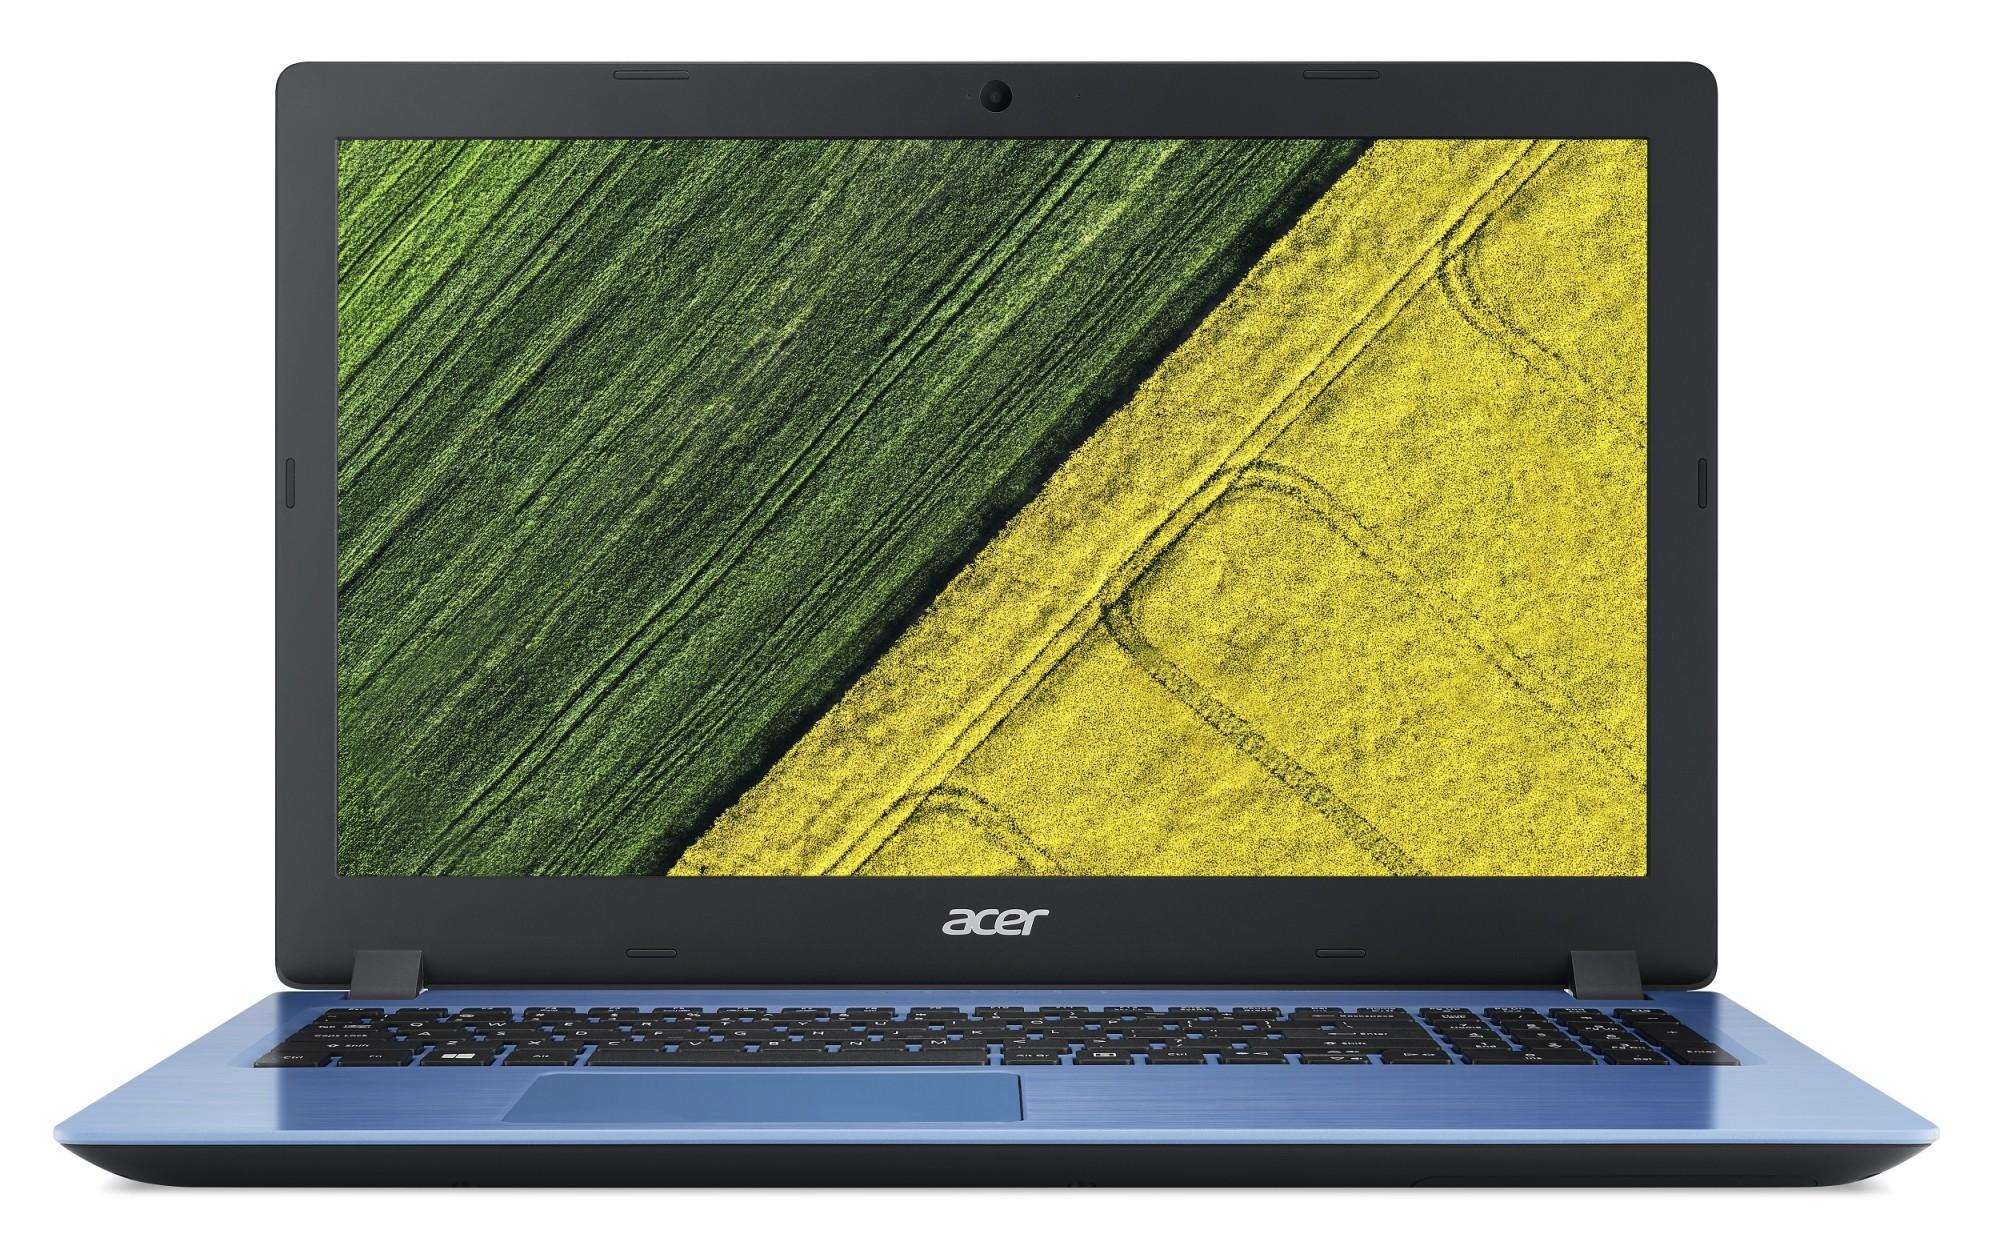 "Acer Aspire 3 (A315-32-P2TD) Pentium N5000/4GB OB+N/128GB SSD+N (HDD)/HD Graphics/15.6"" FHD LED matný/W10 Home/Blue"